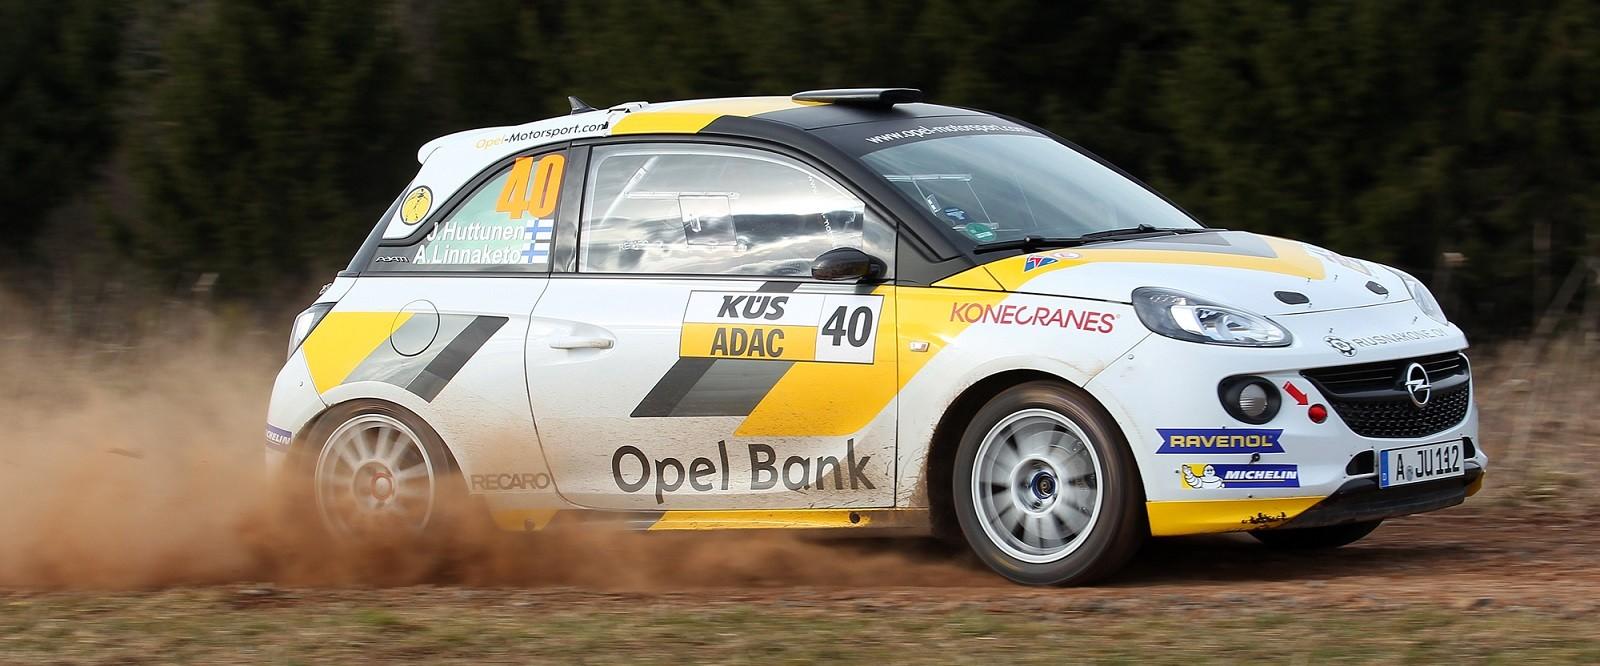 Jari Huttunen Antti Linnaketo  Opel Adam R2 Photo Karsten Huber